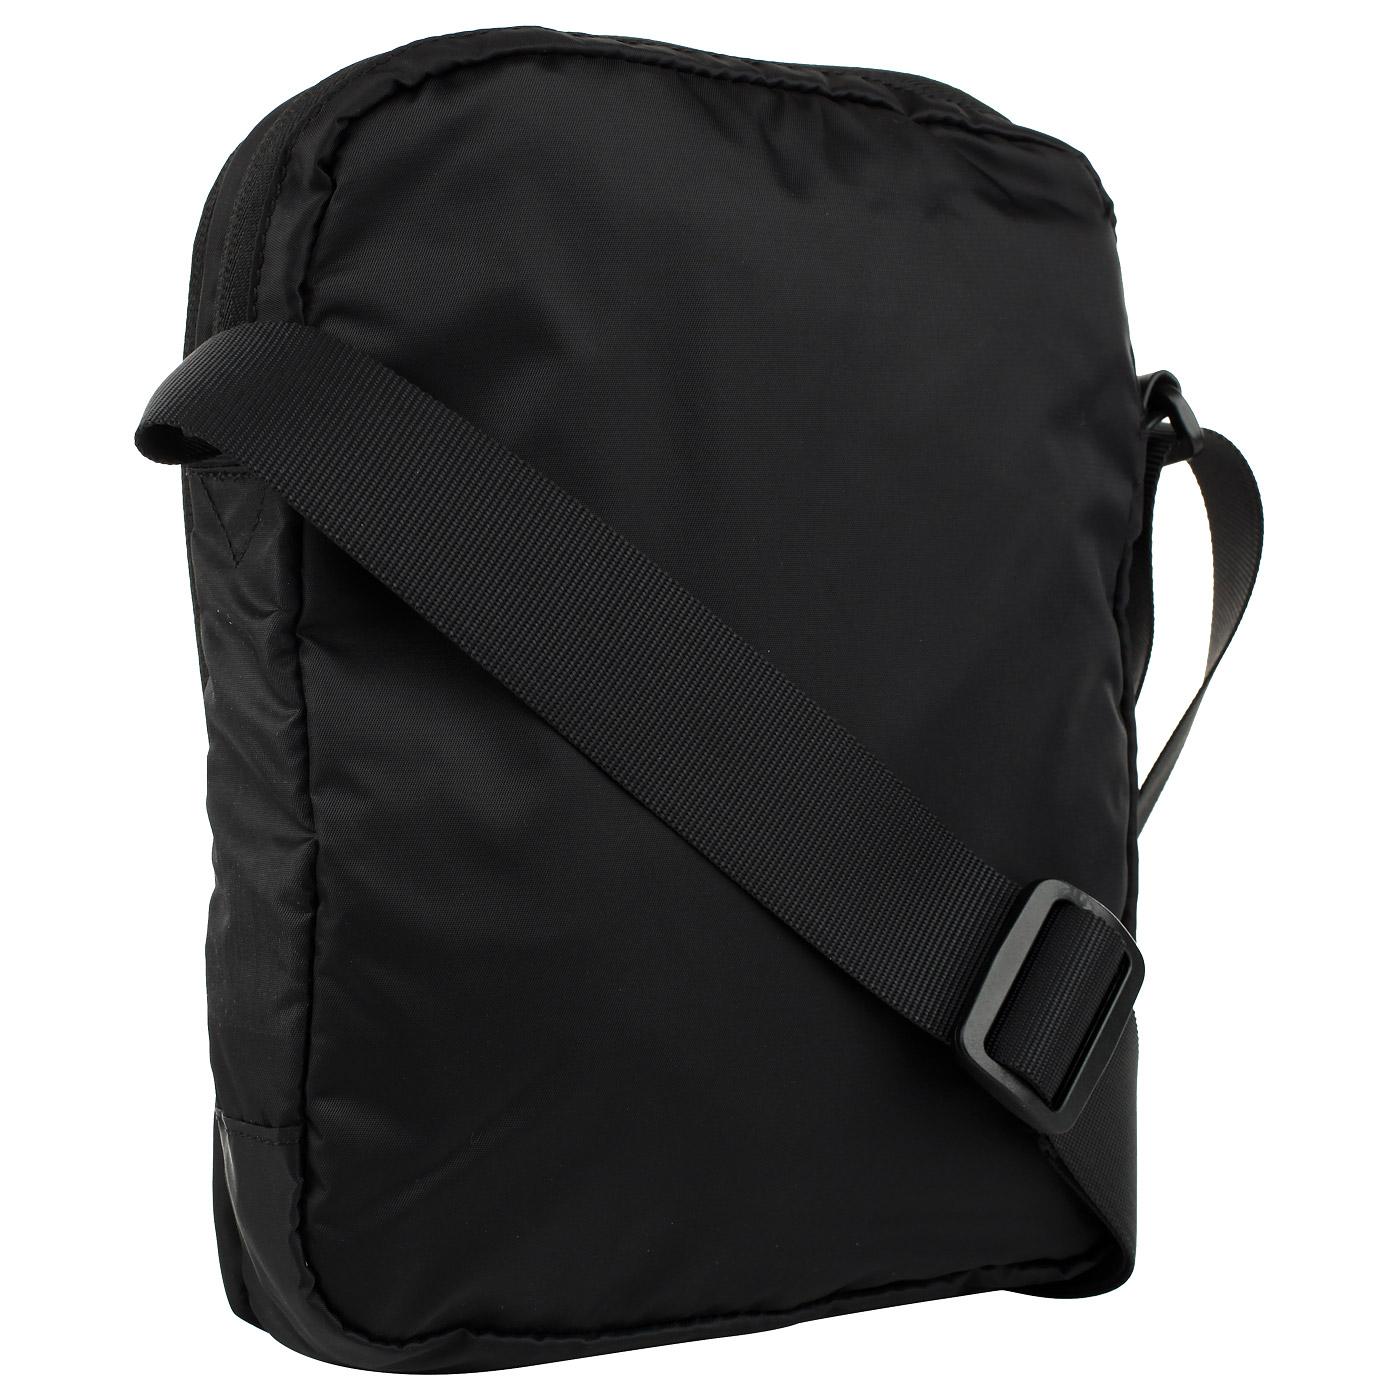 4fcb35bb2fa4 Мужская сумка через плечо Bikkembergs 6BDD5203_black - 2000557789401 ...